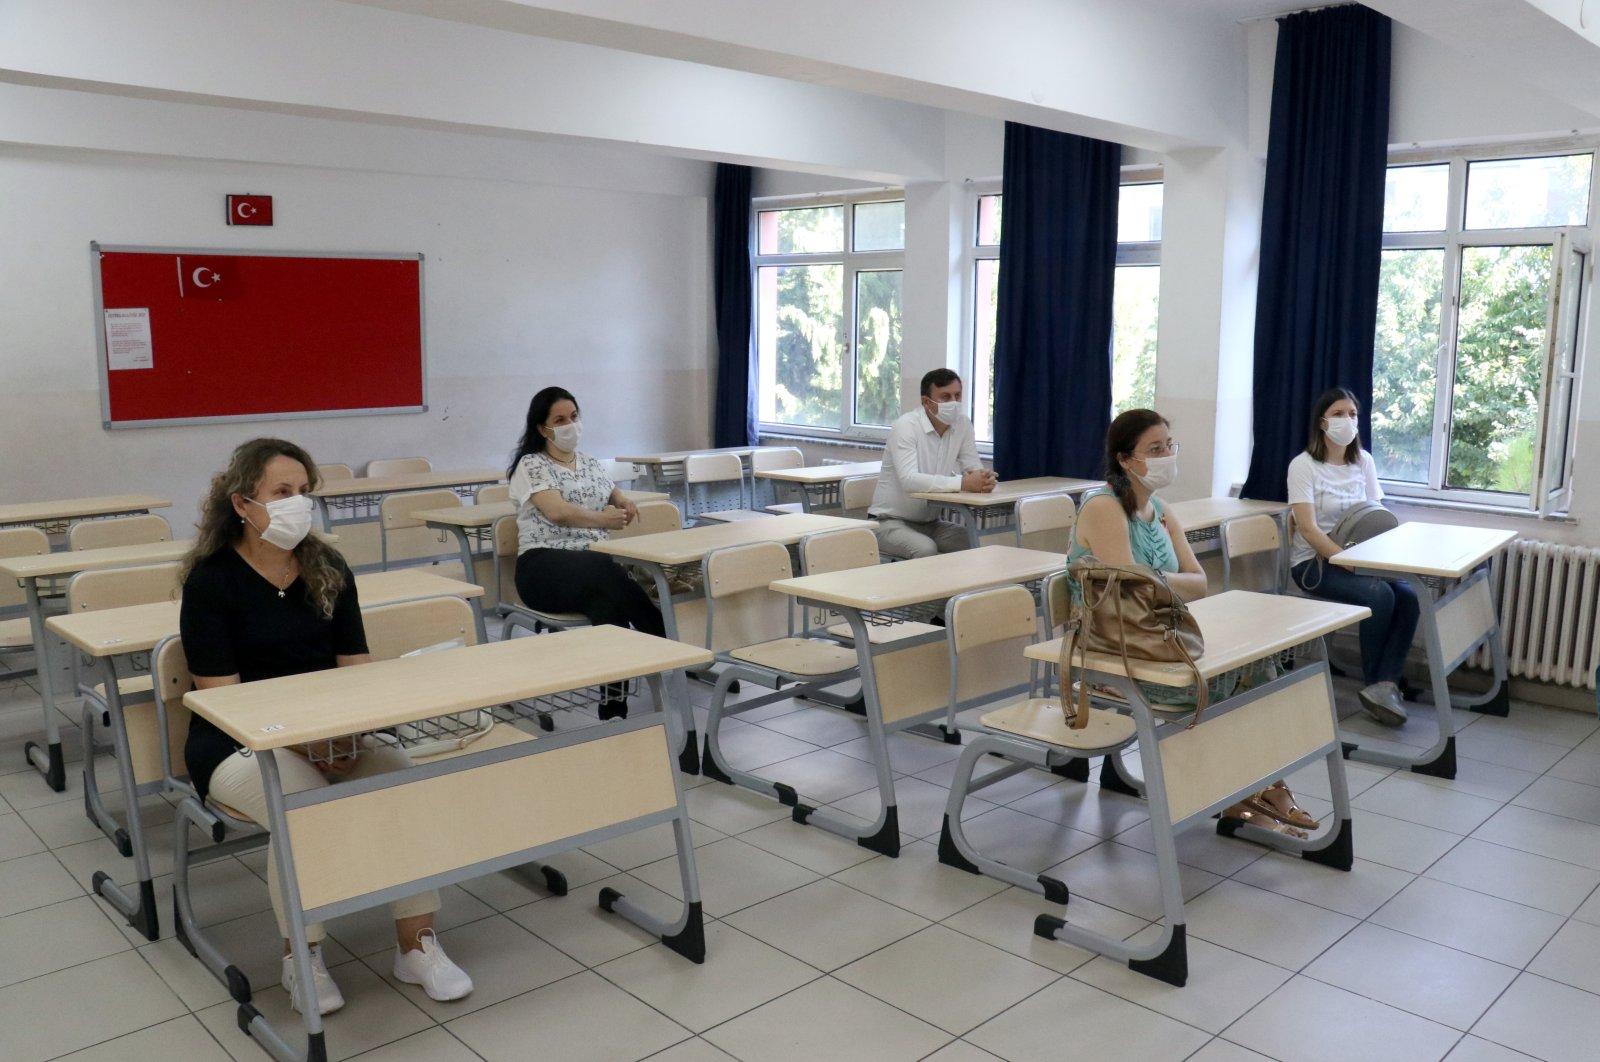 Teachers attend a training program at a school in Kırklareli, northwestern Turkey, Aug. 24, 2020. (AA Photo)